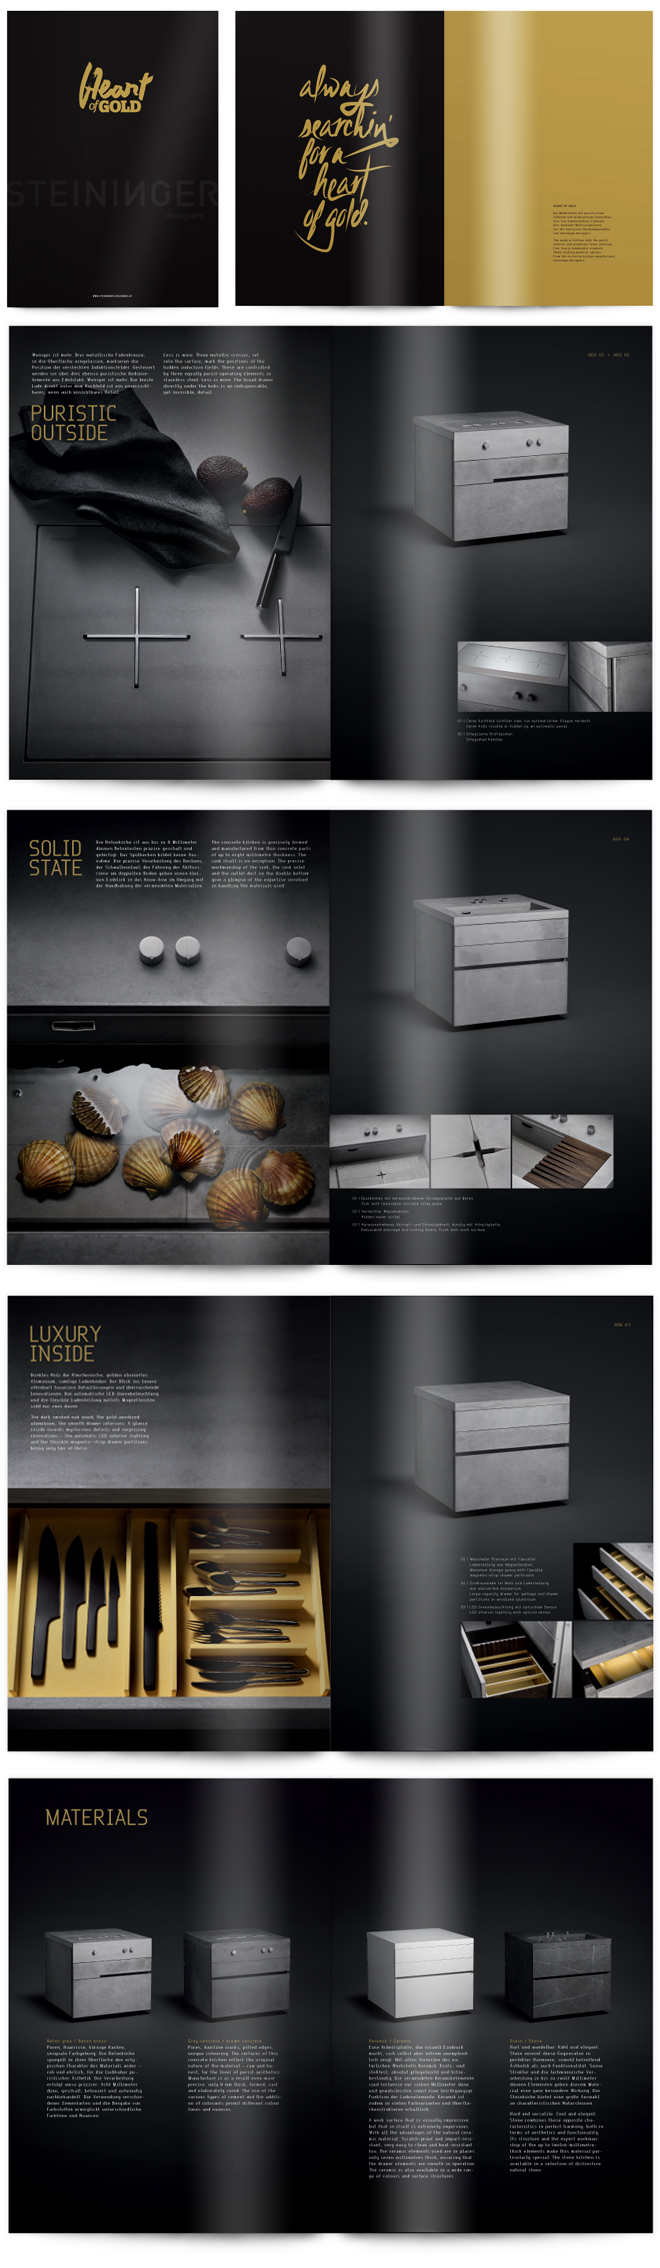 Logodesign, Corporate Design, Webdesign für Steininger Designers ...